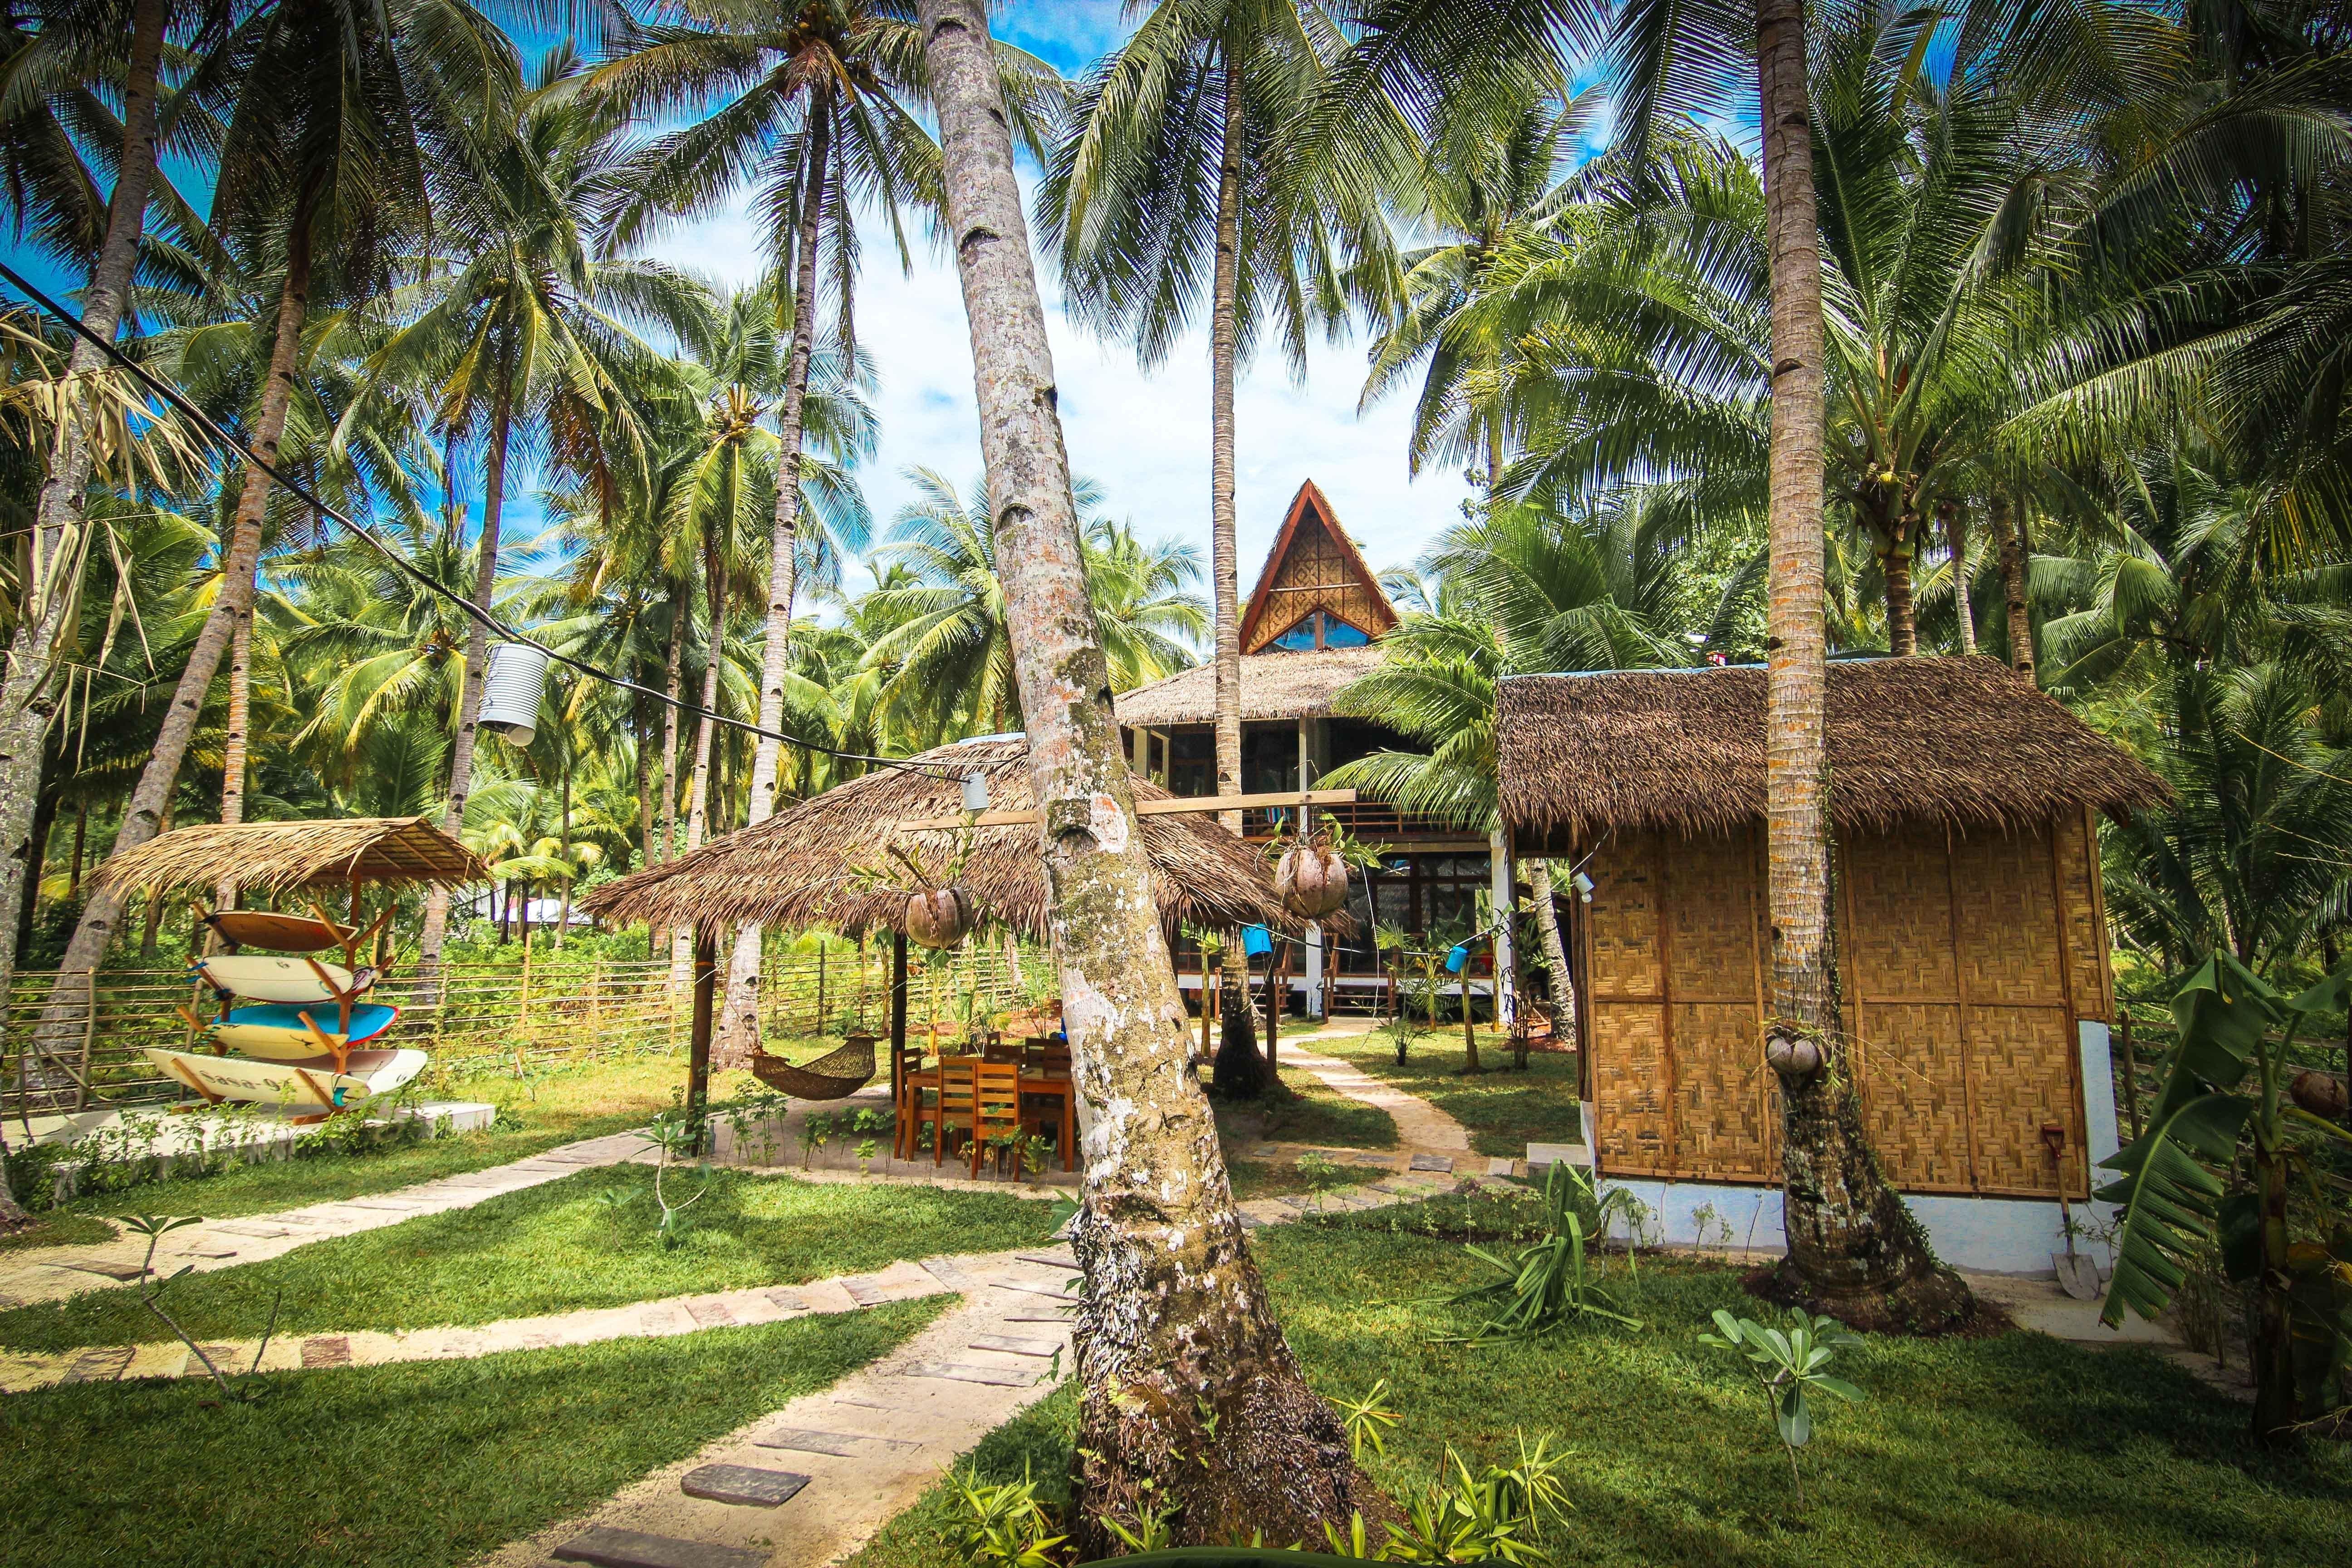 surfholidays com surfing carabao beach houses siargao